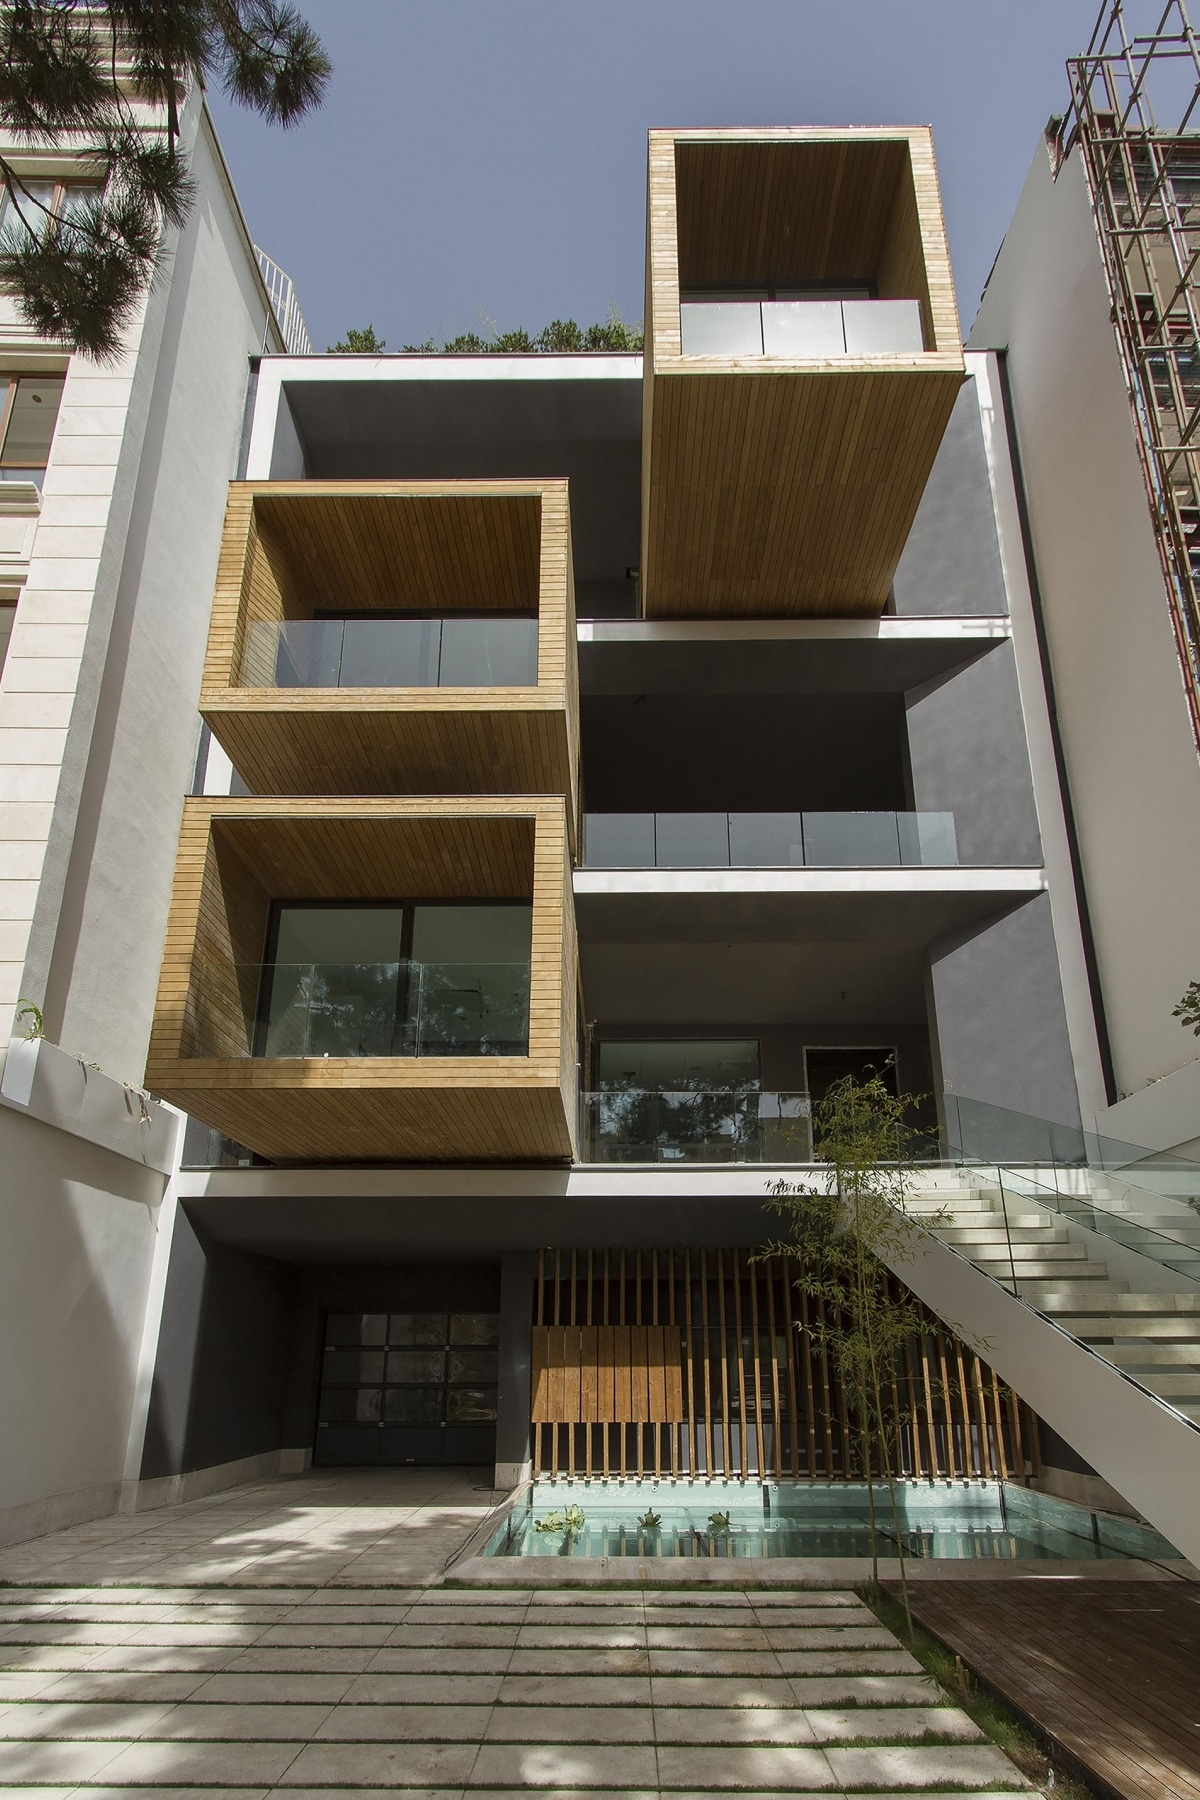 Design Home Exterior Pop Architecture Interior Interior Design | Stair Room Exterior Design | 3 Floor Building | Box Type | Brick | Open Plan | Amazing